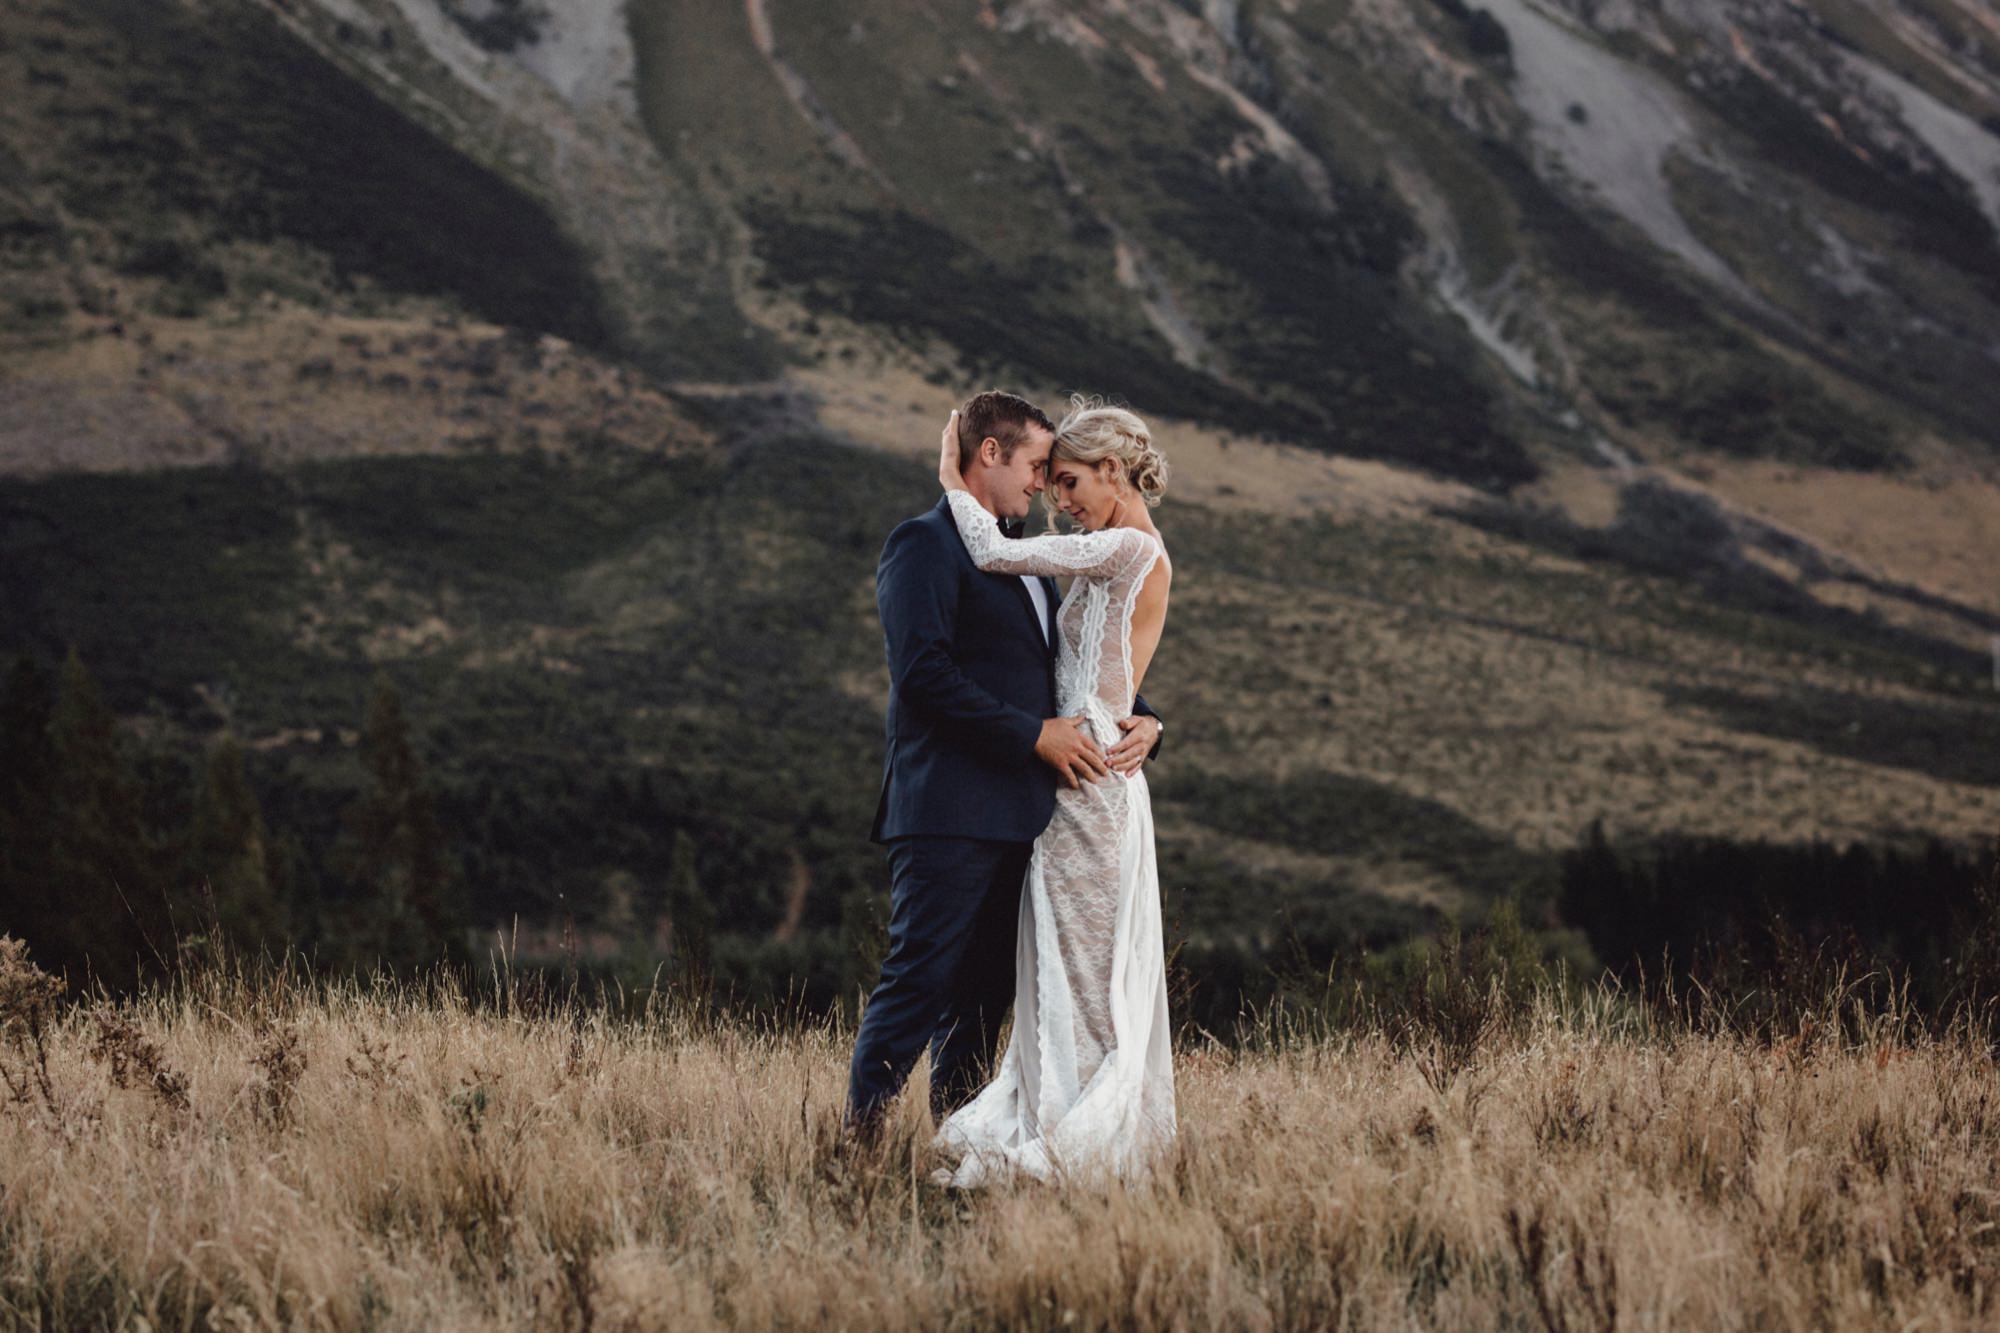 how to pose for wedding photos